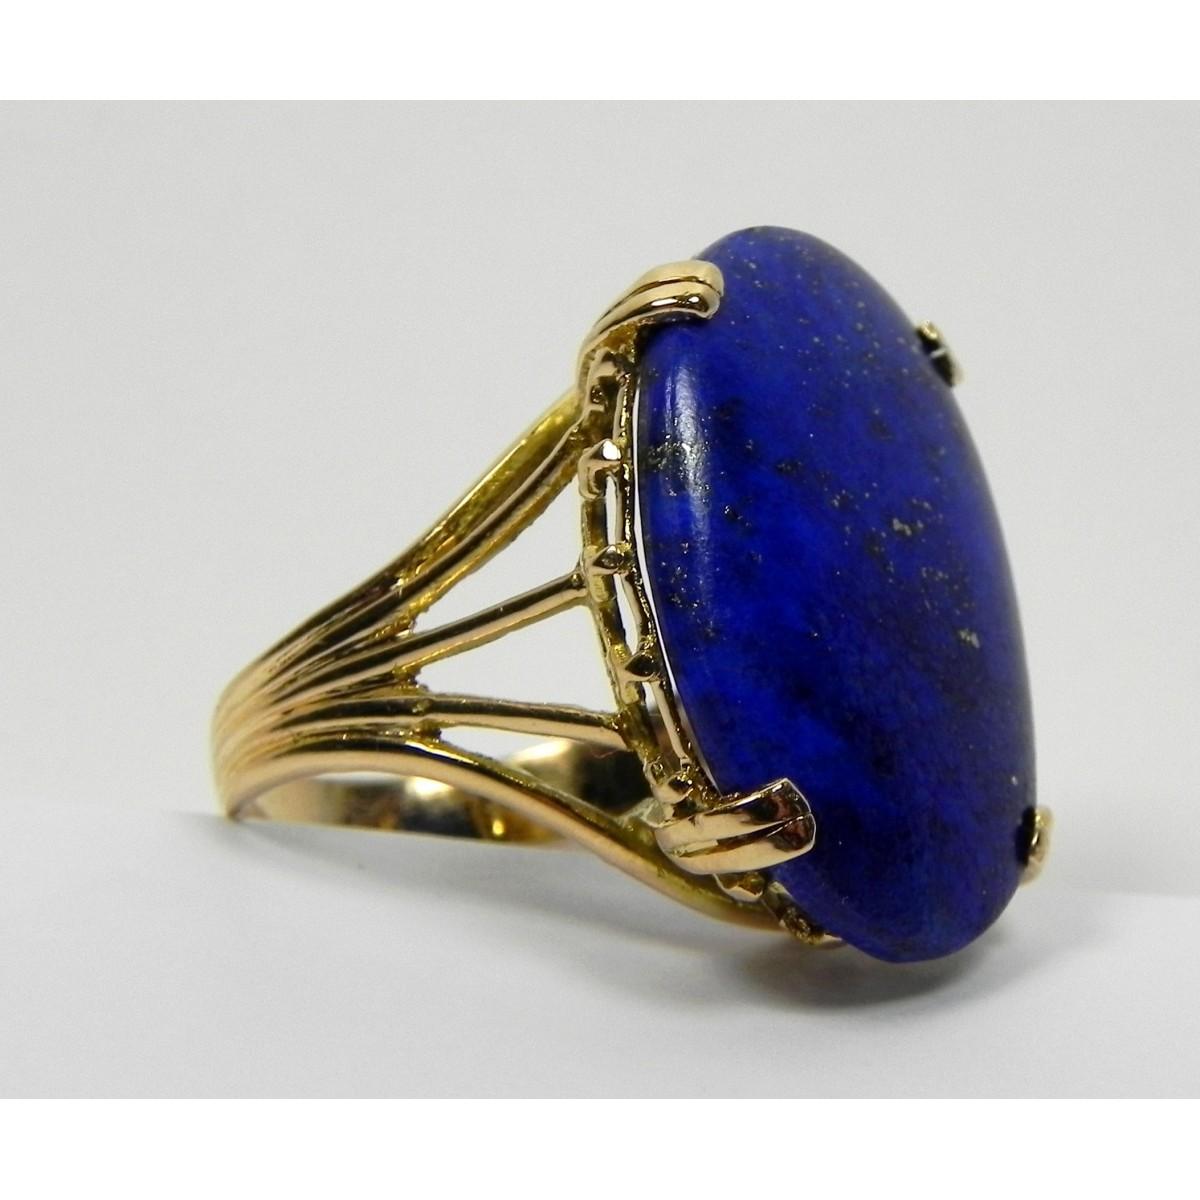 bague cabochon lapis lazuli et or 750 muse or. Black Bedroom Furniture Sets. Home Design Ideas